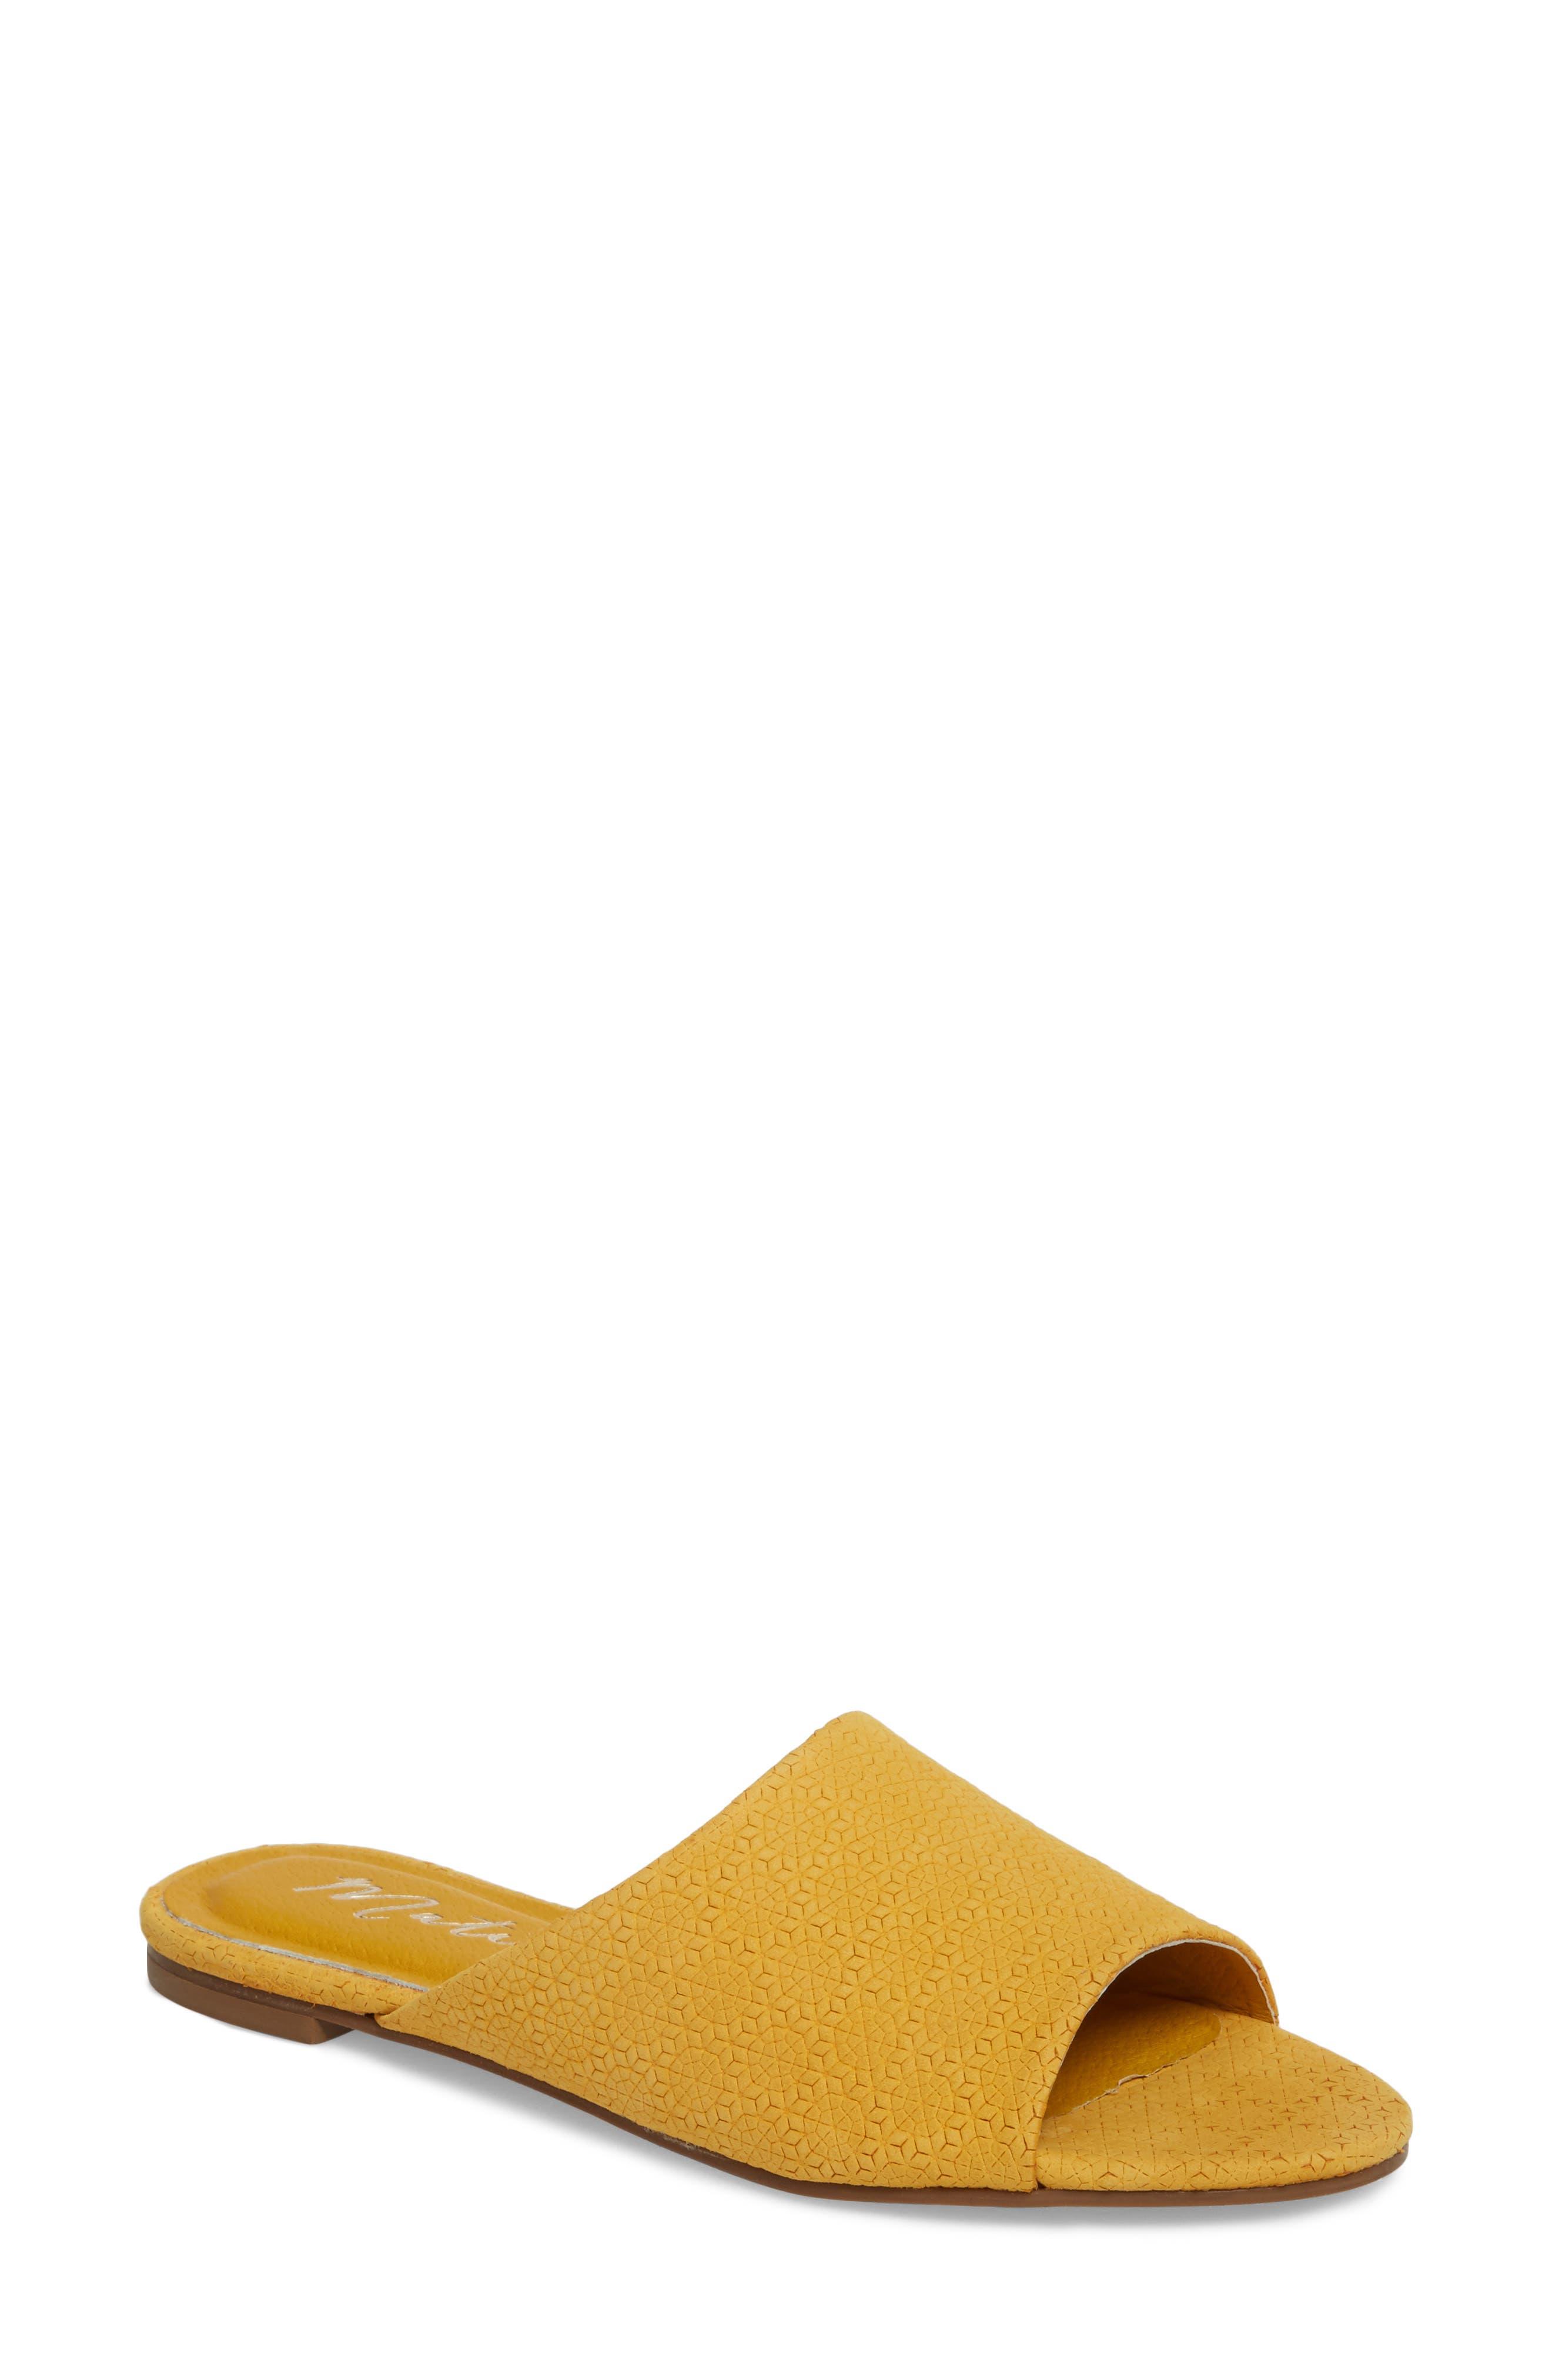 Lira Sandal,                             Main thumbnail 1, color,                             Mango Leather